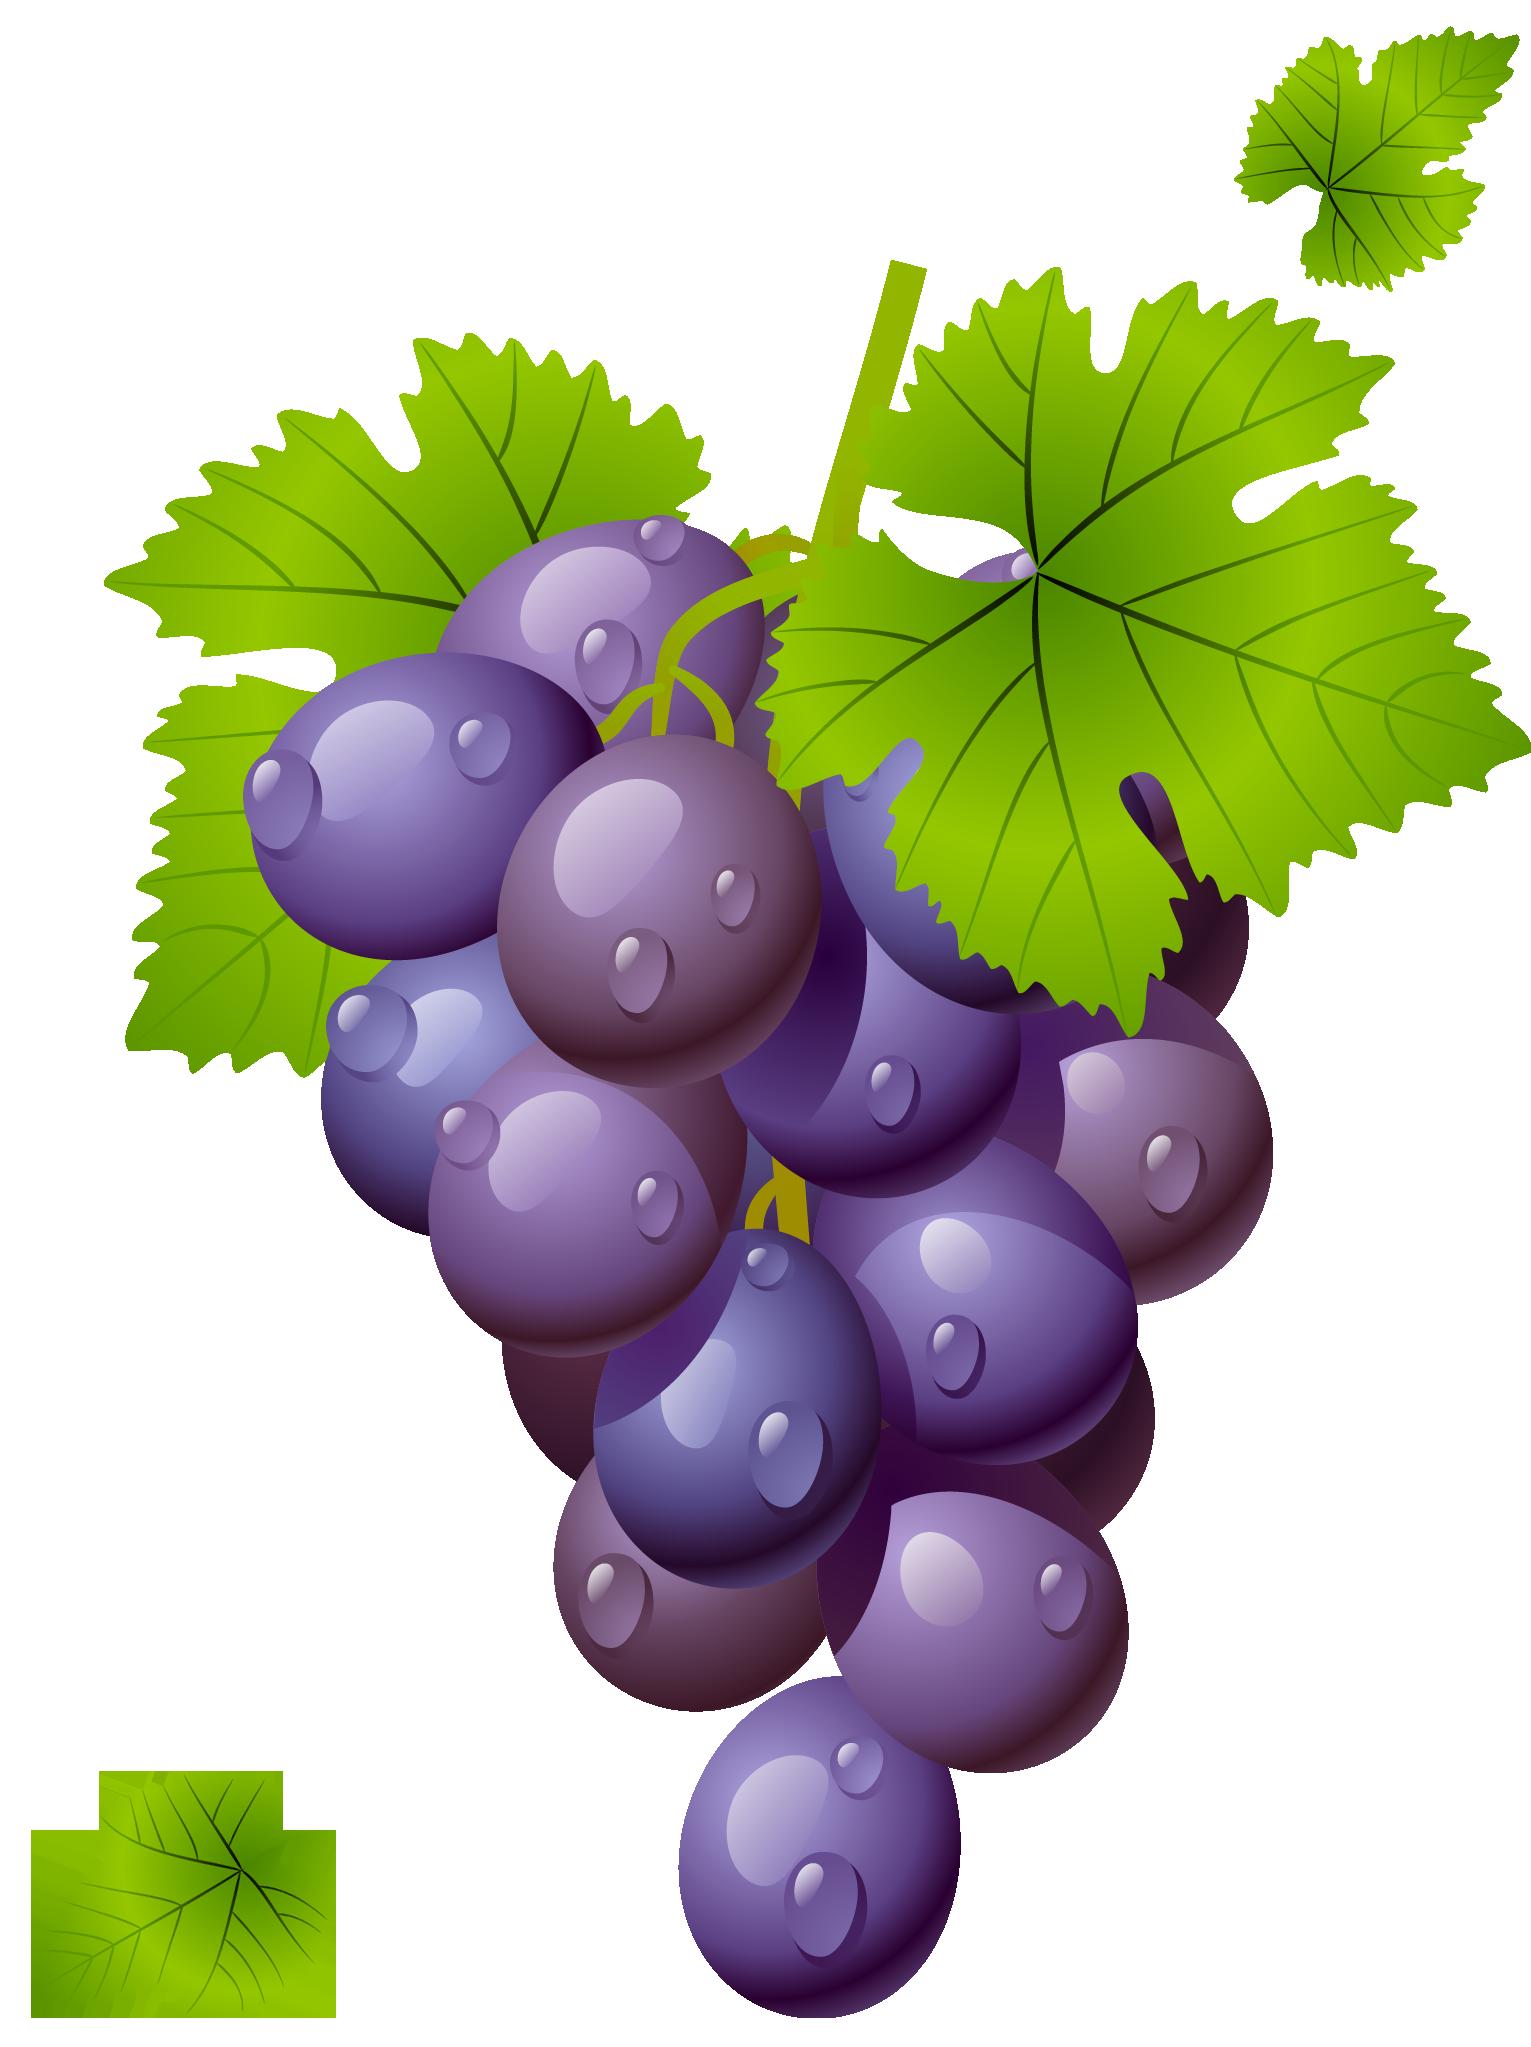 Grapes vine clipart free images 2.